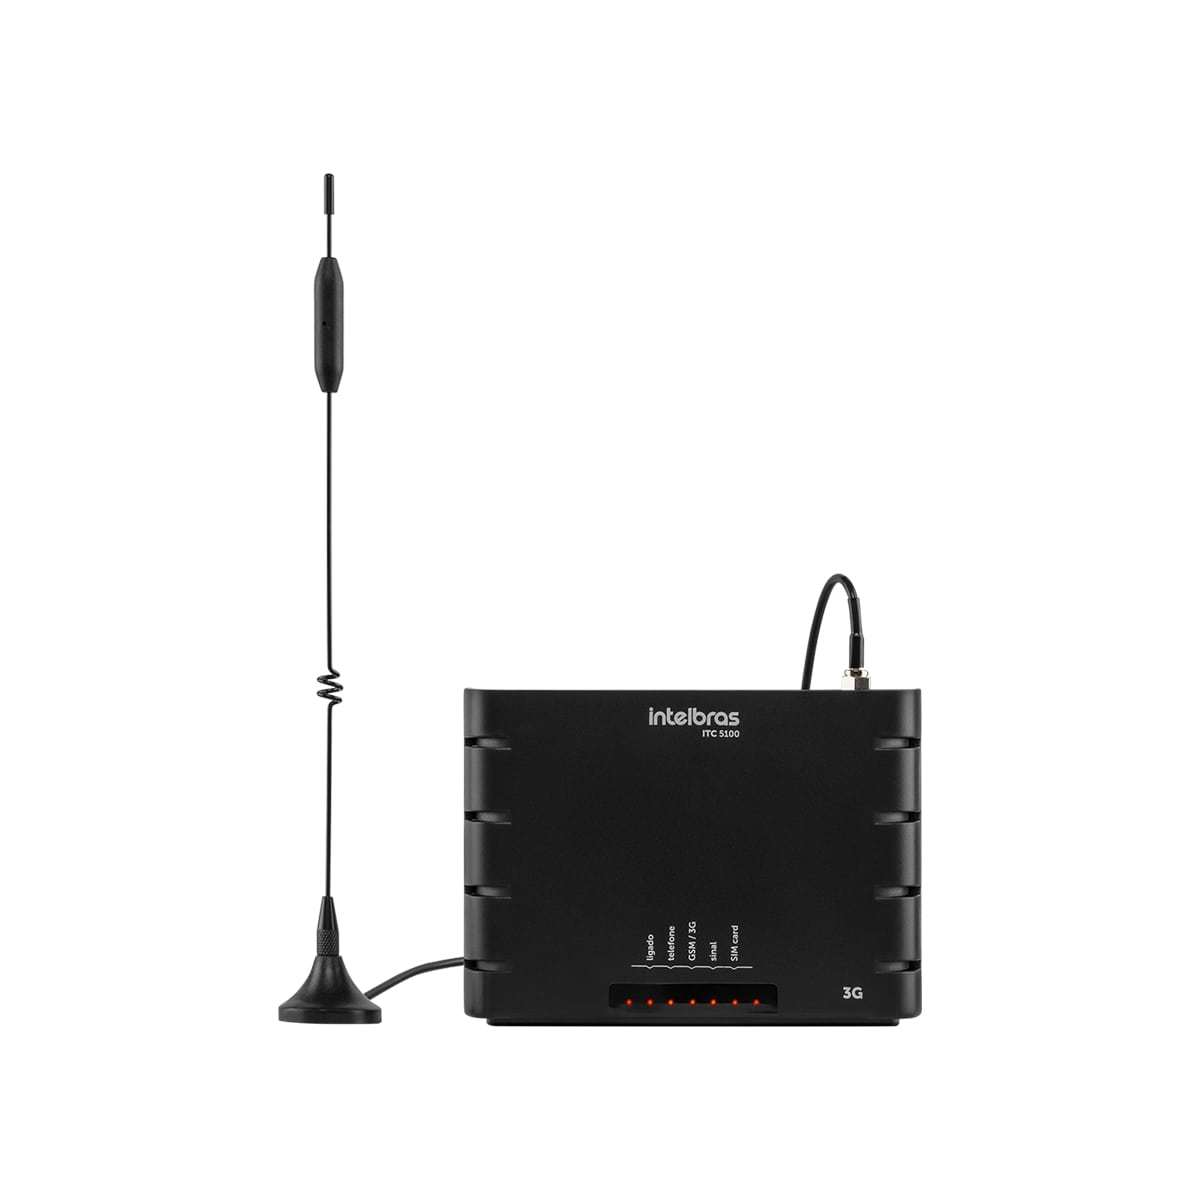 Interface Celular 3G - ITC 5100 Intelbras